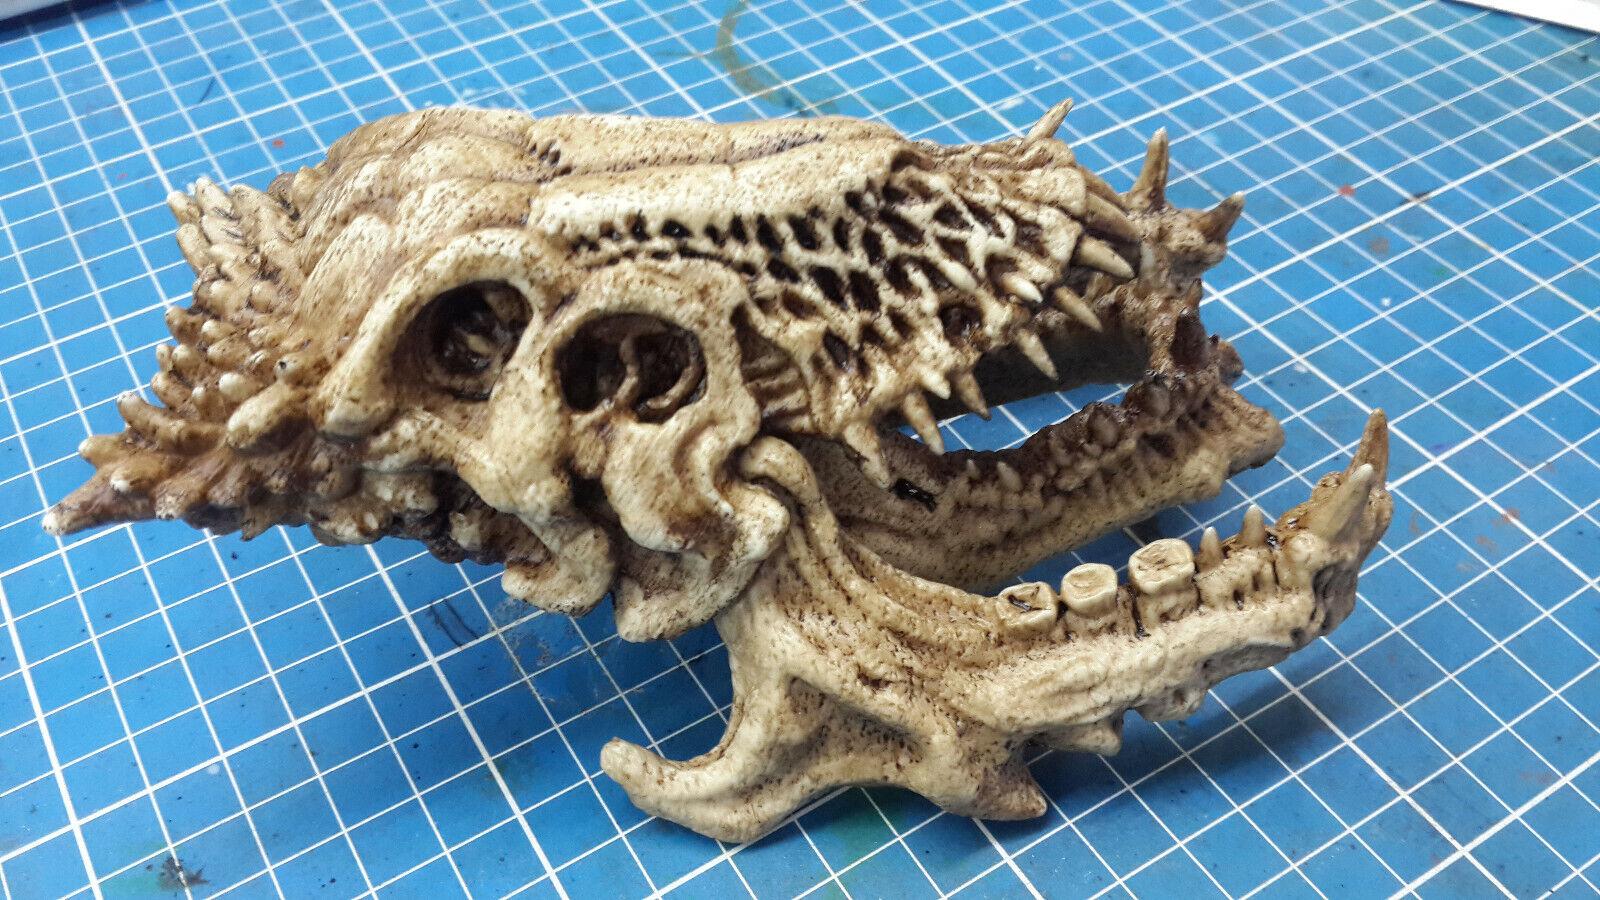 Prossoator 2 Trophy Skull 1 6 Scale Scale Scale Replica 57ffda